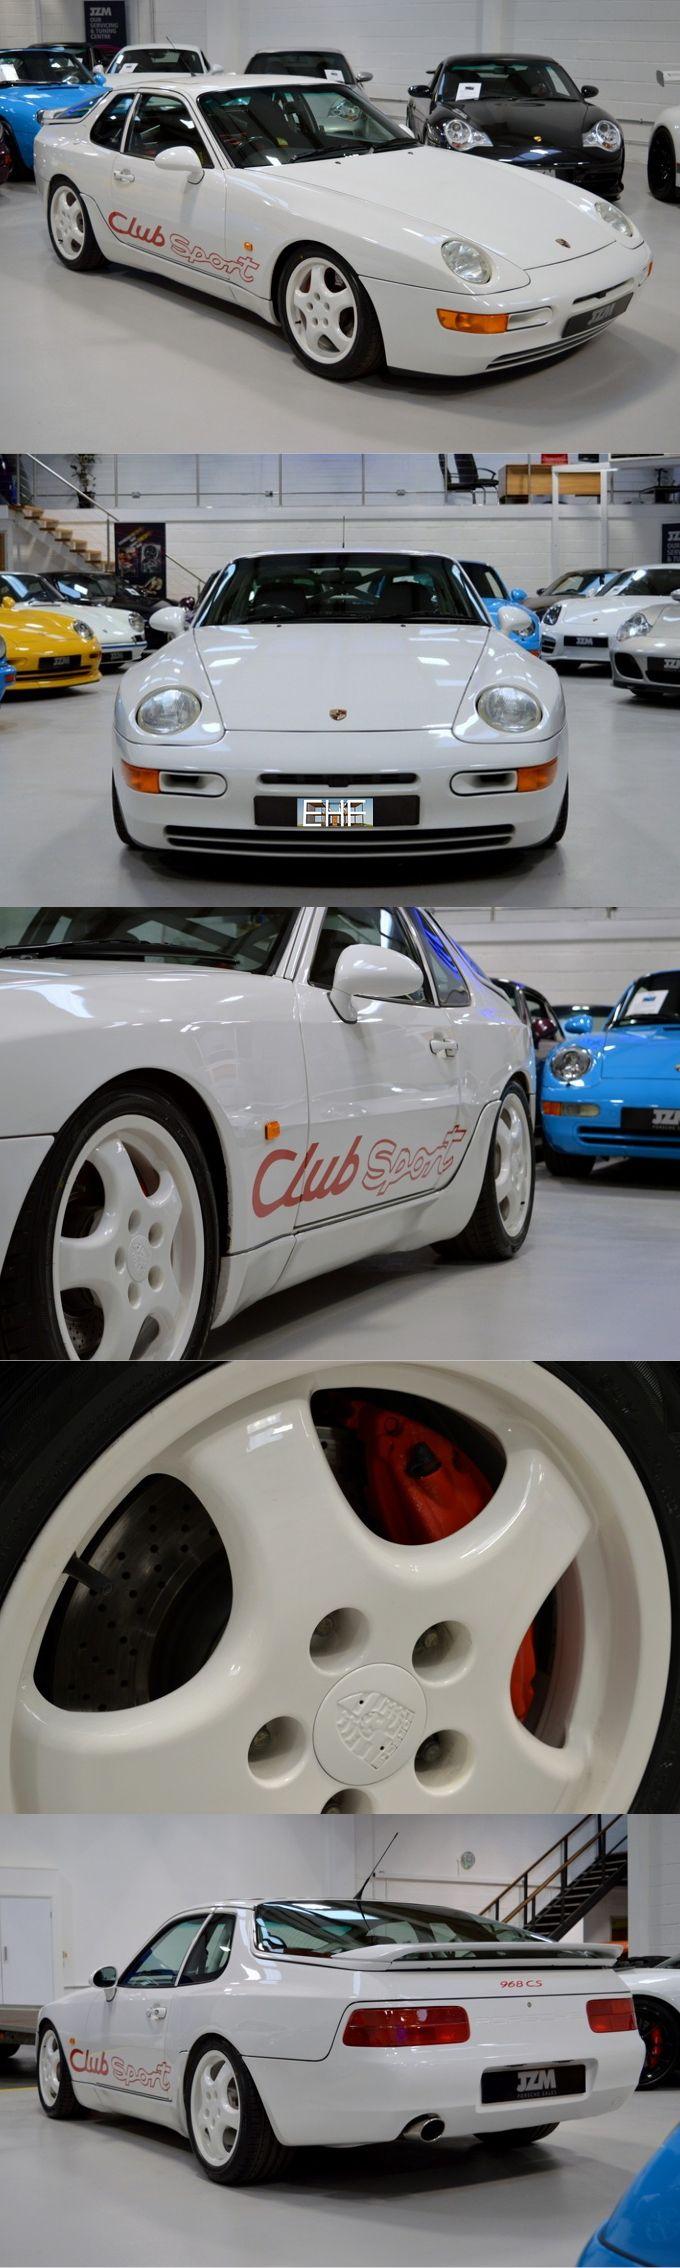 1993 Porsche 968 CS / Germany / white red / Club Sport